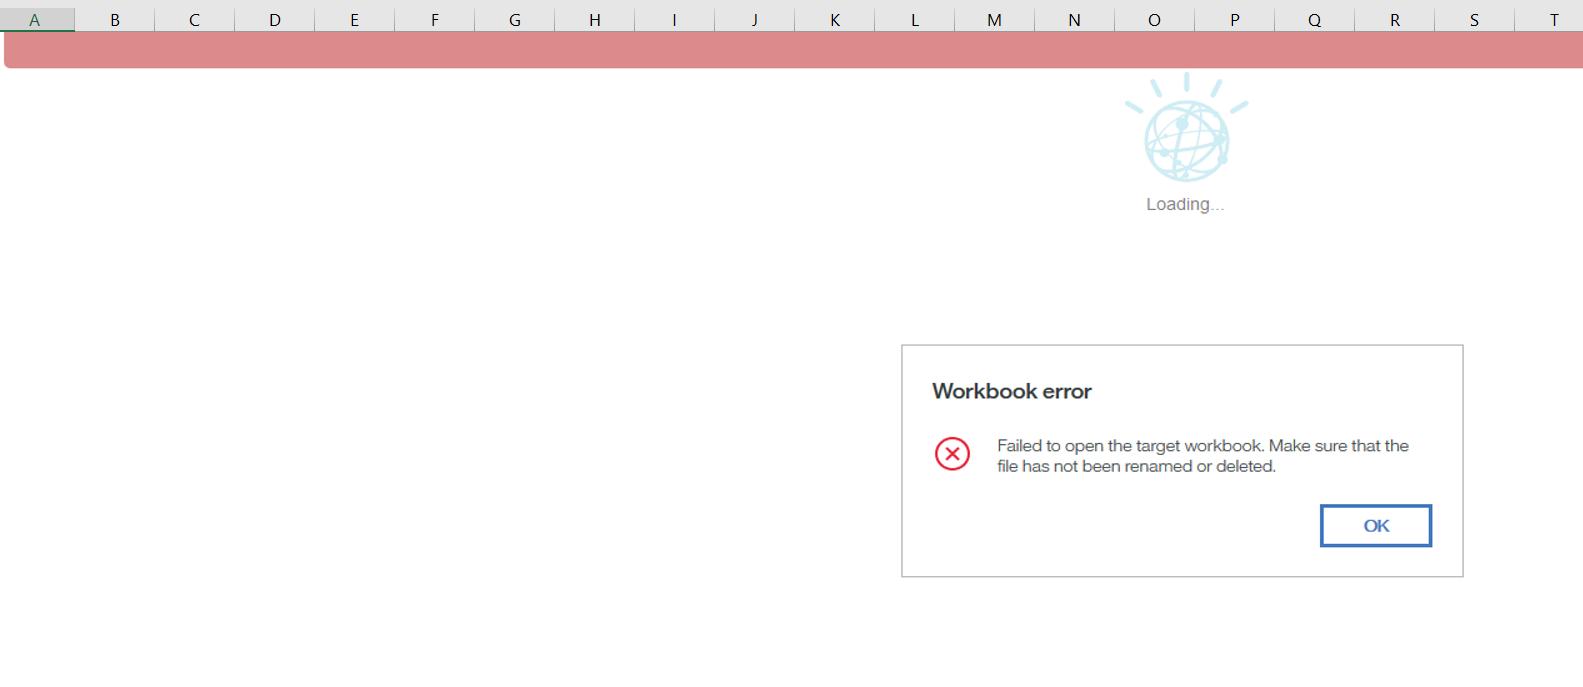 error in workbook